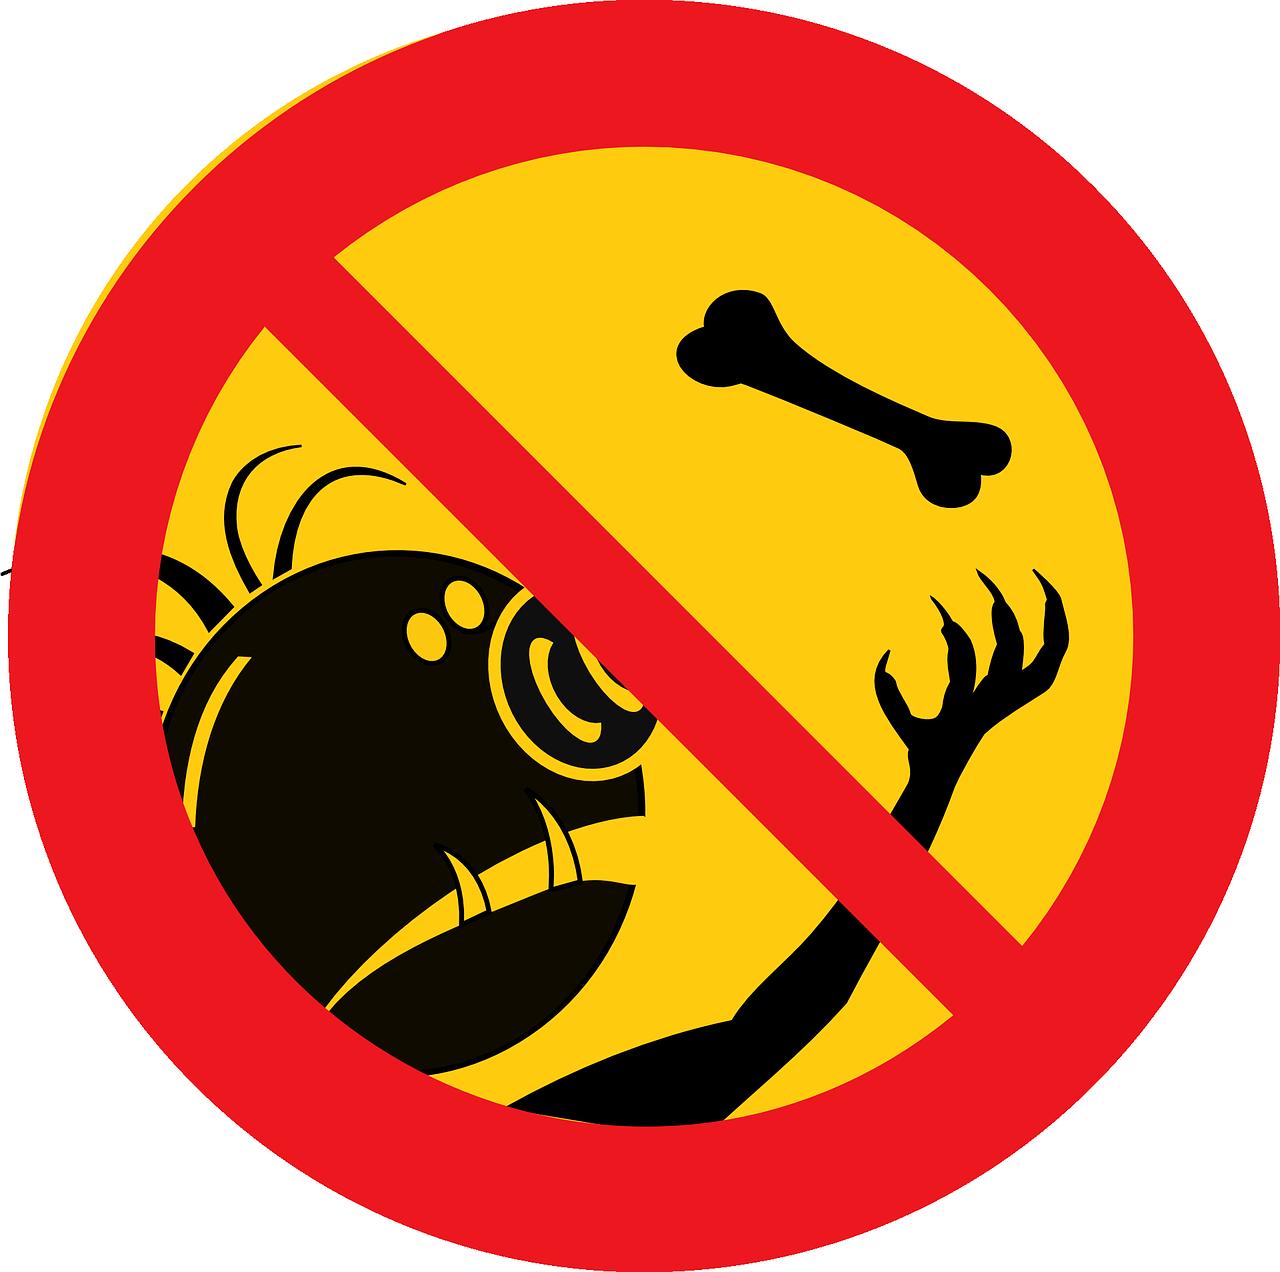 Где в беларуси запрещен троллинг